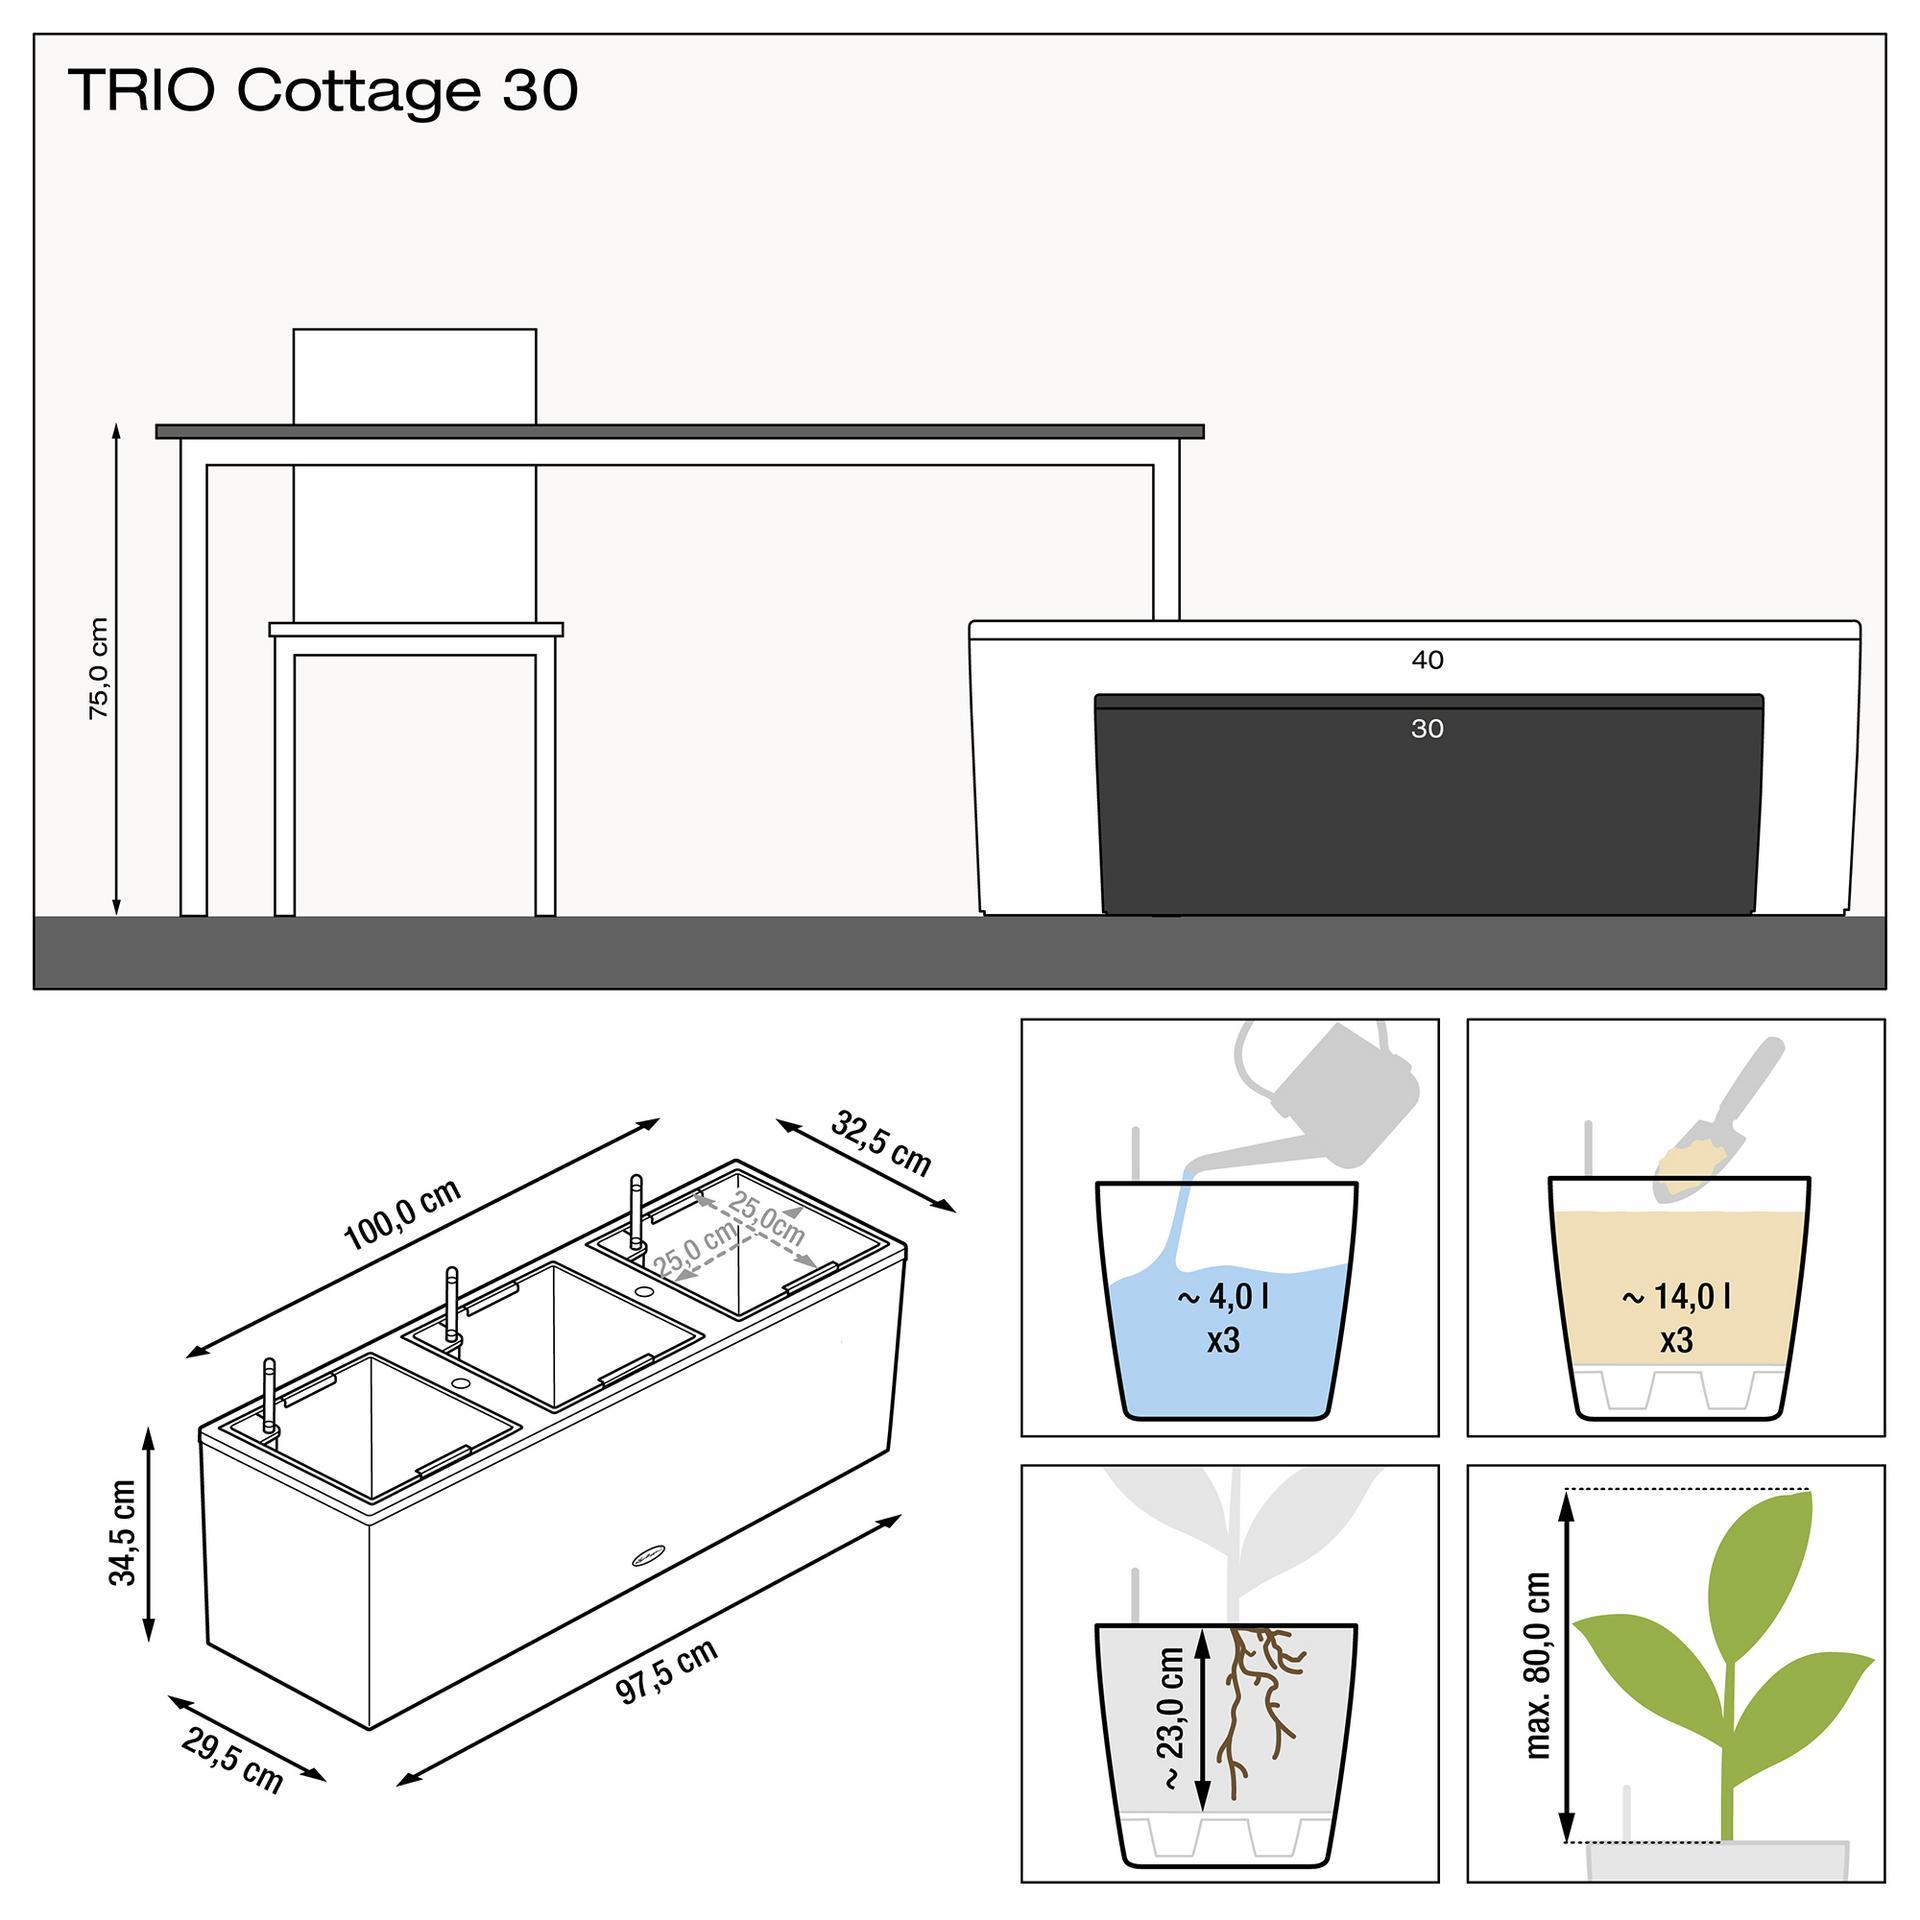 le_trio-cottage30_product_addi_nz